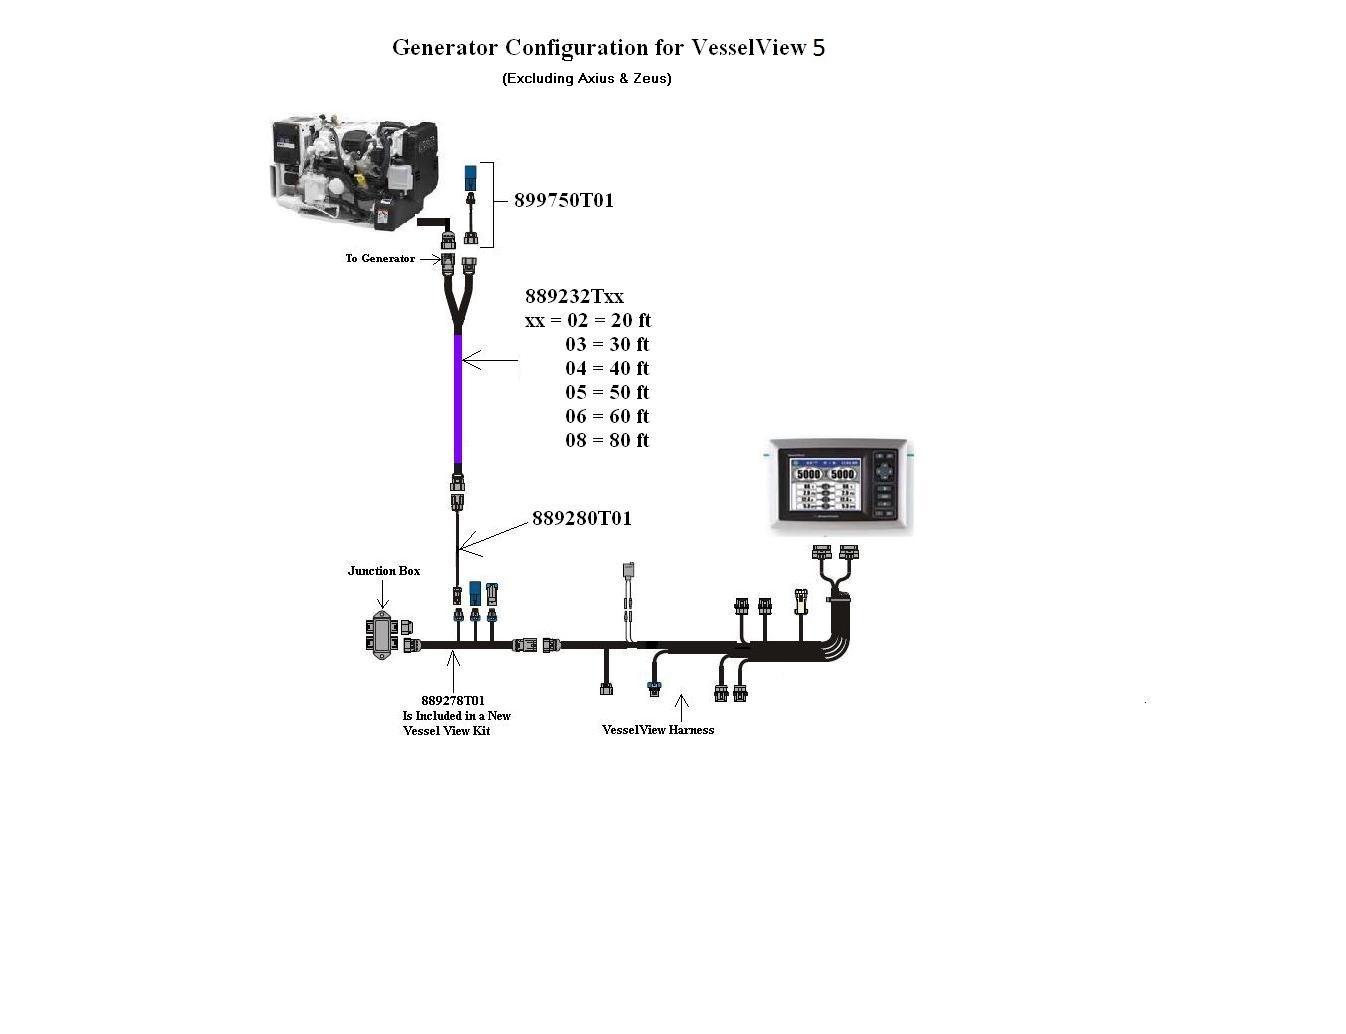 Kohler 5E generator - how to get engine data via SmartCraft ... on